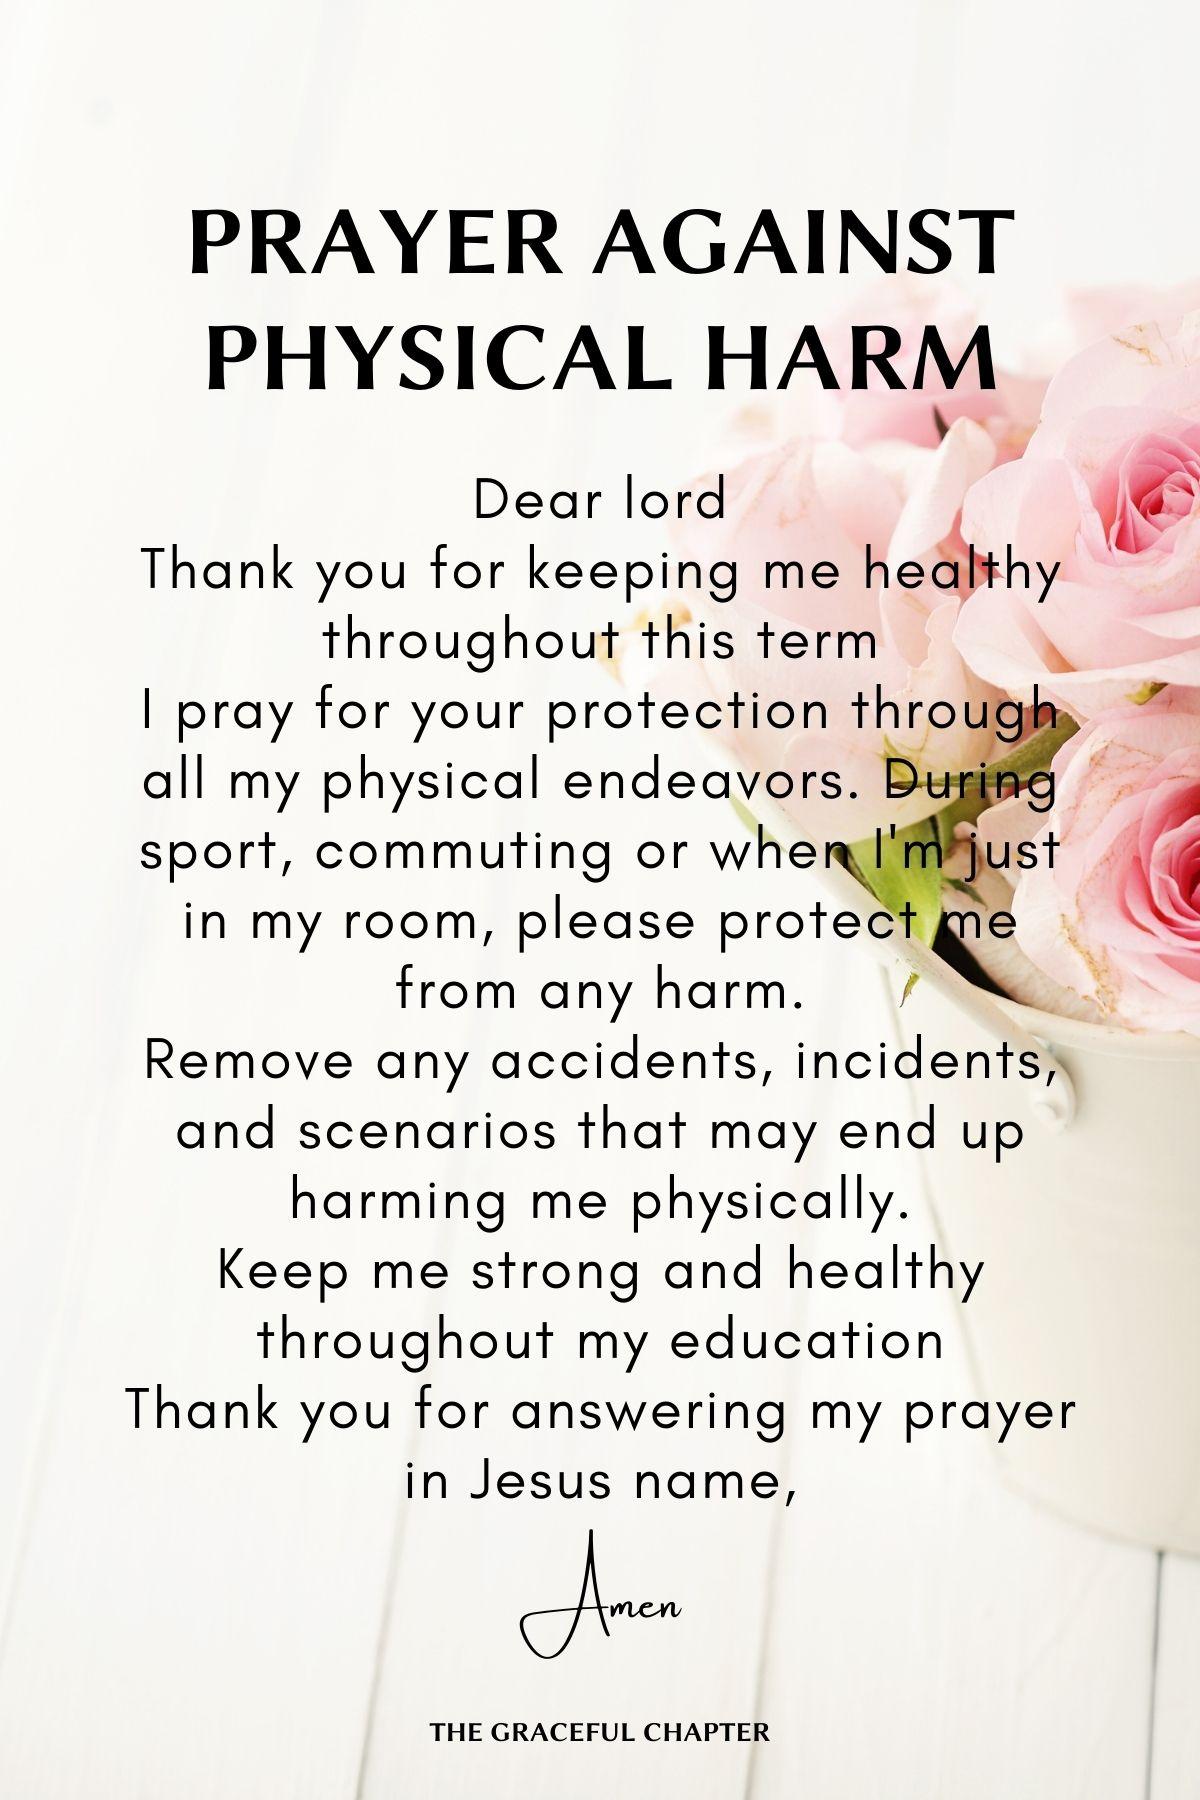 Prayer against physical harm